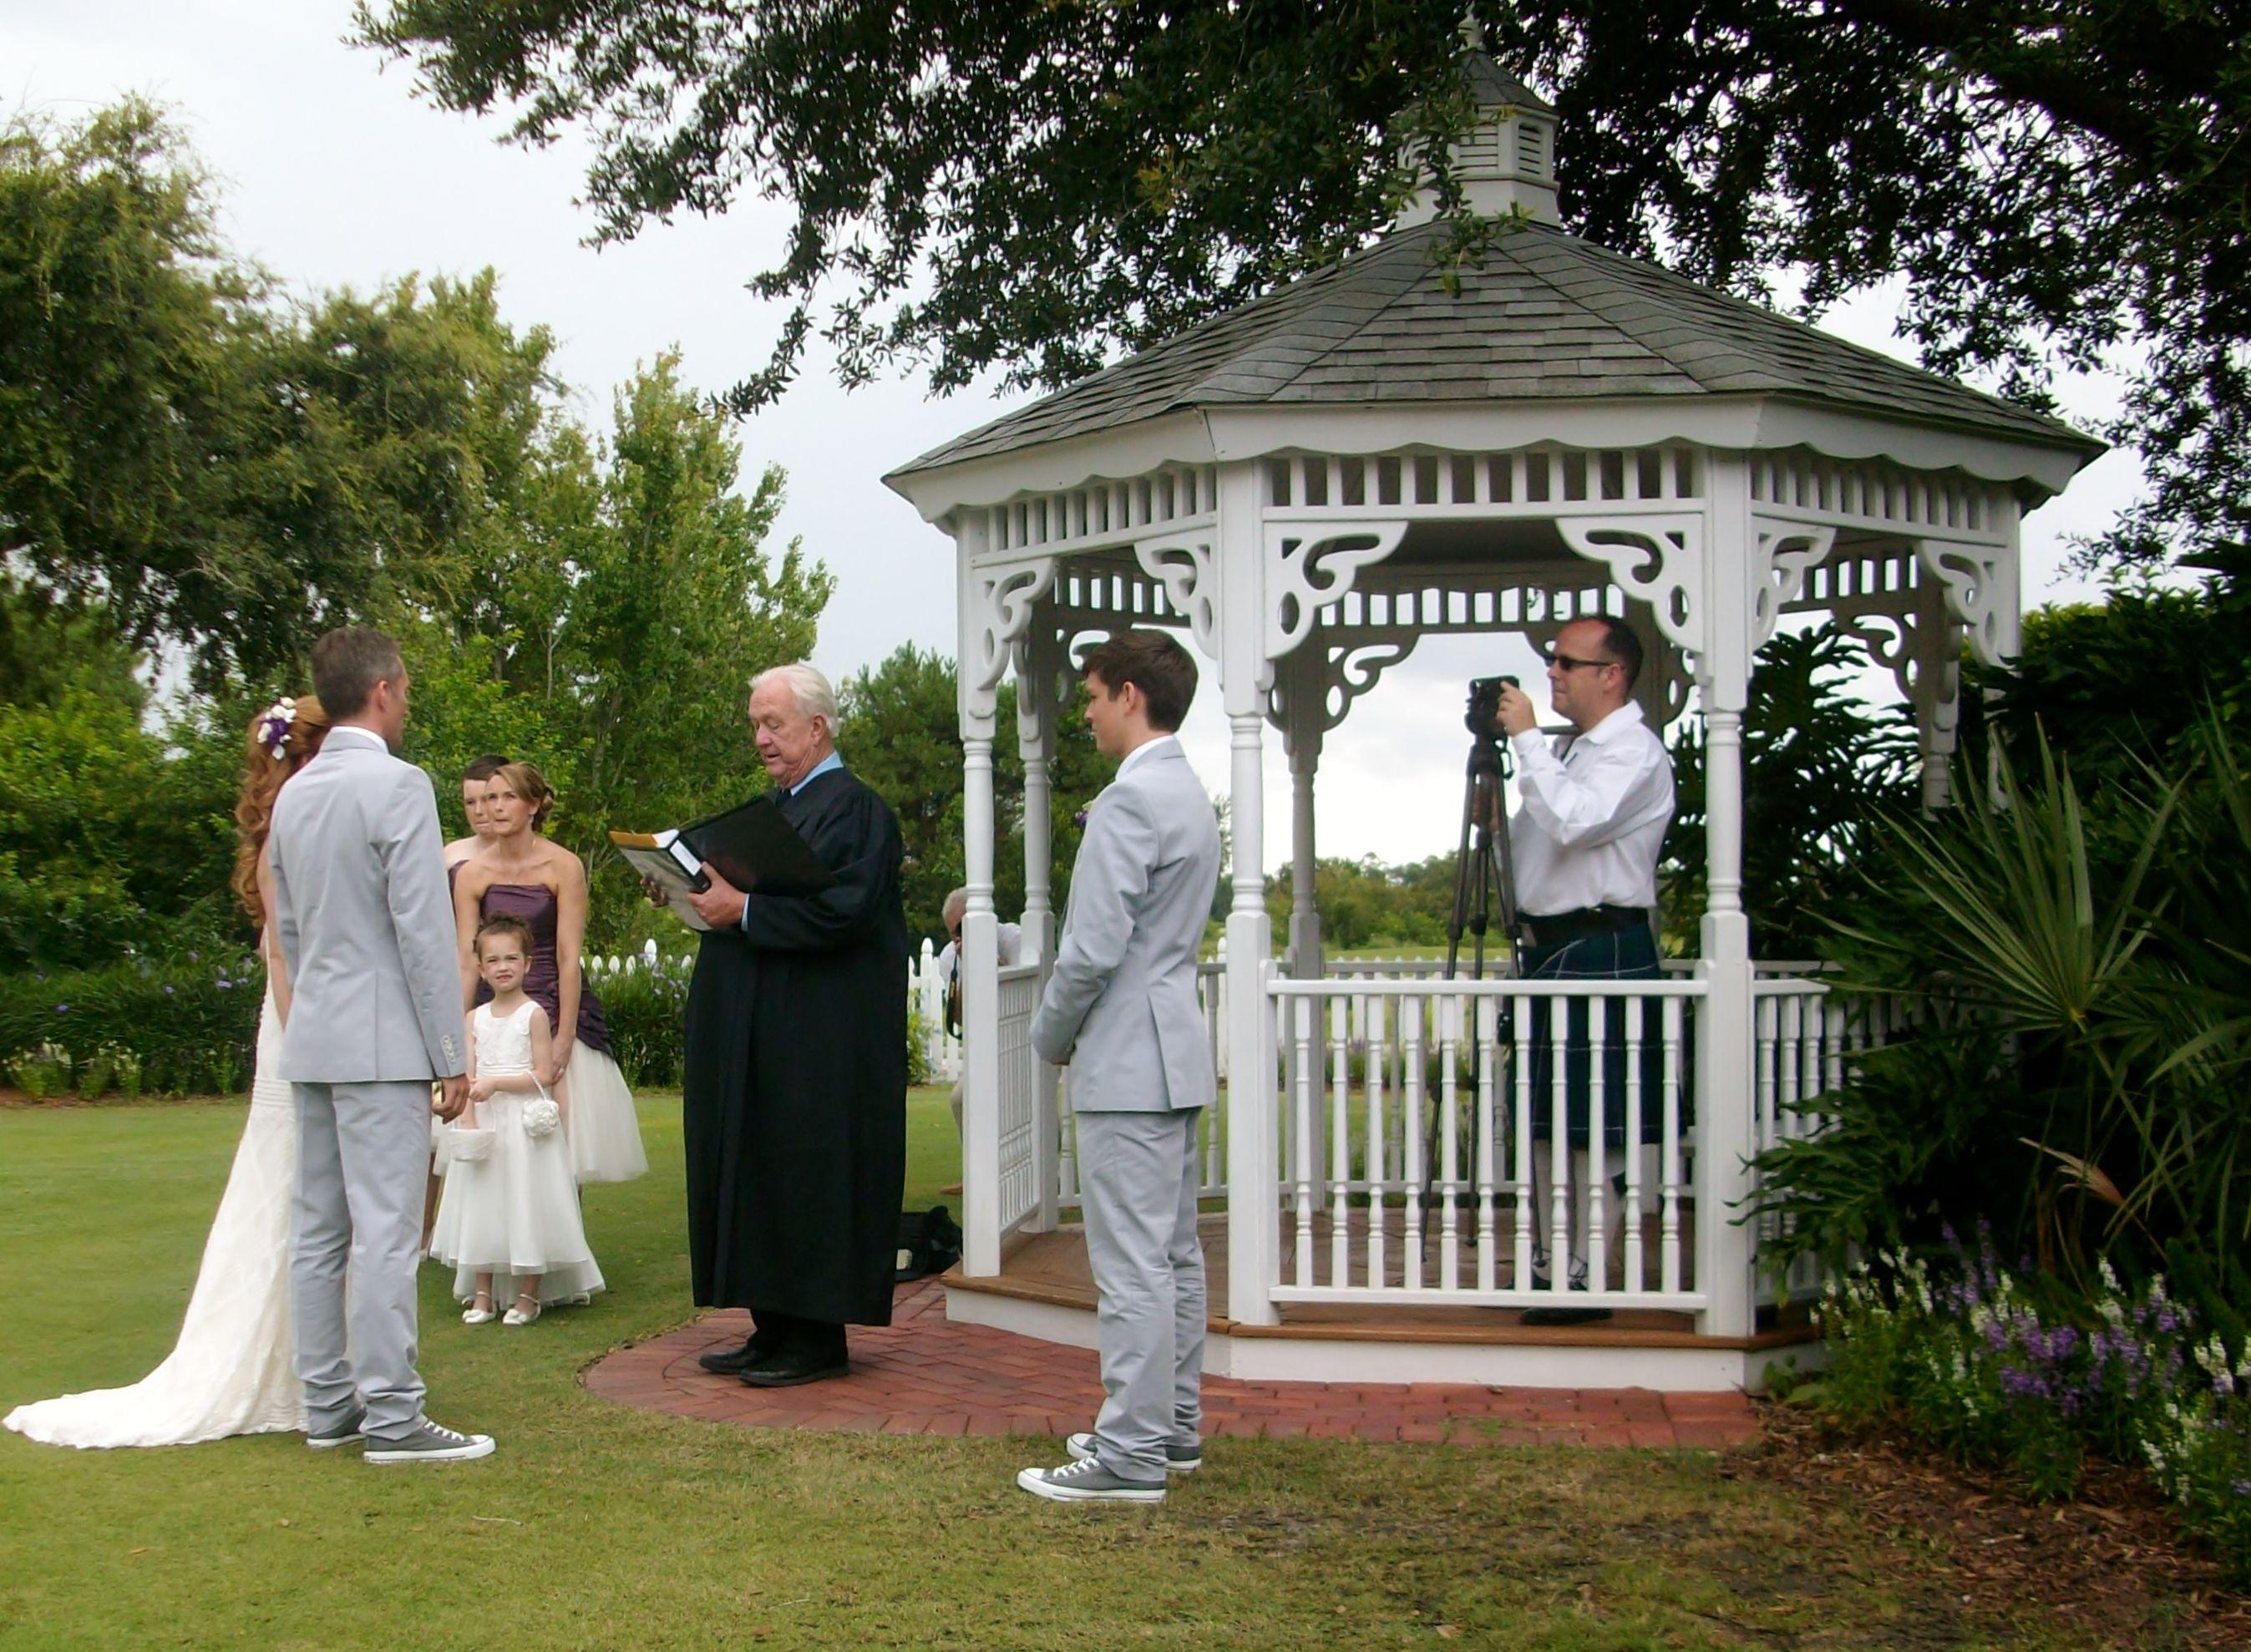 Destination Wedding At Celebration Golf Club South Of Orlando Florida This Location Has